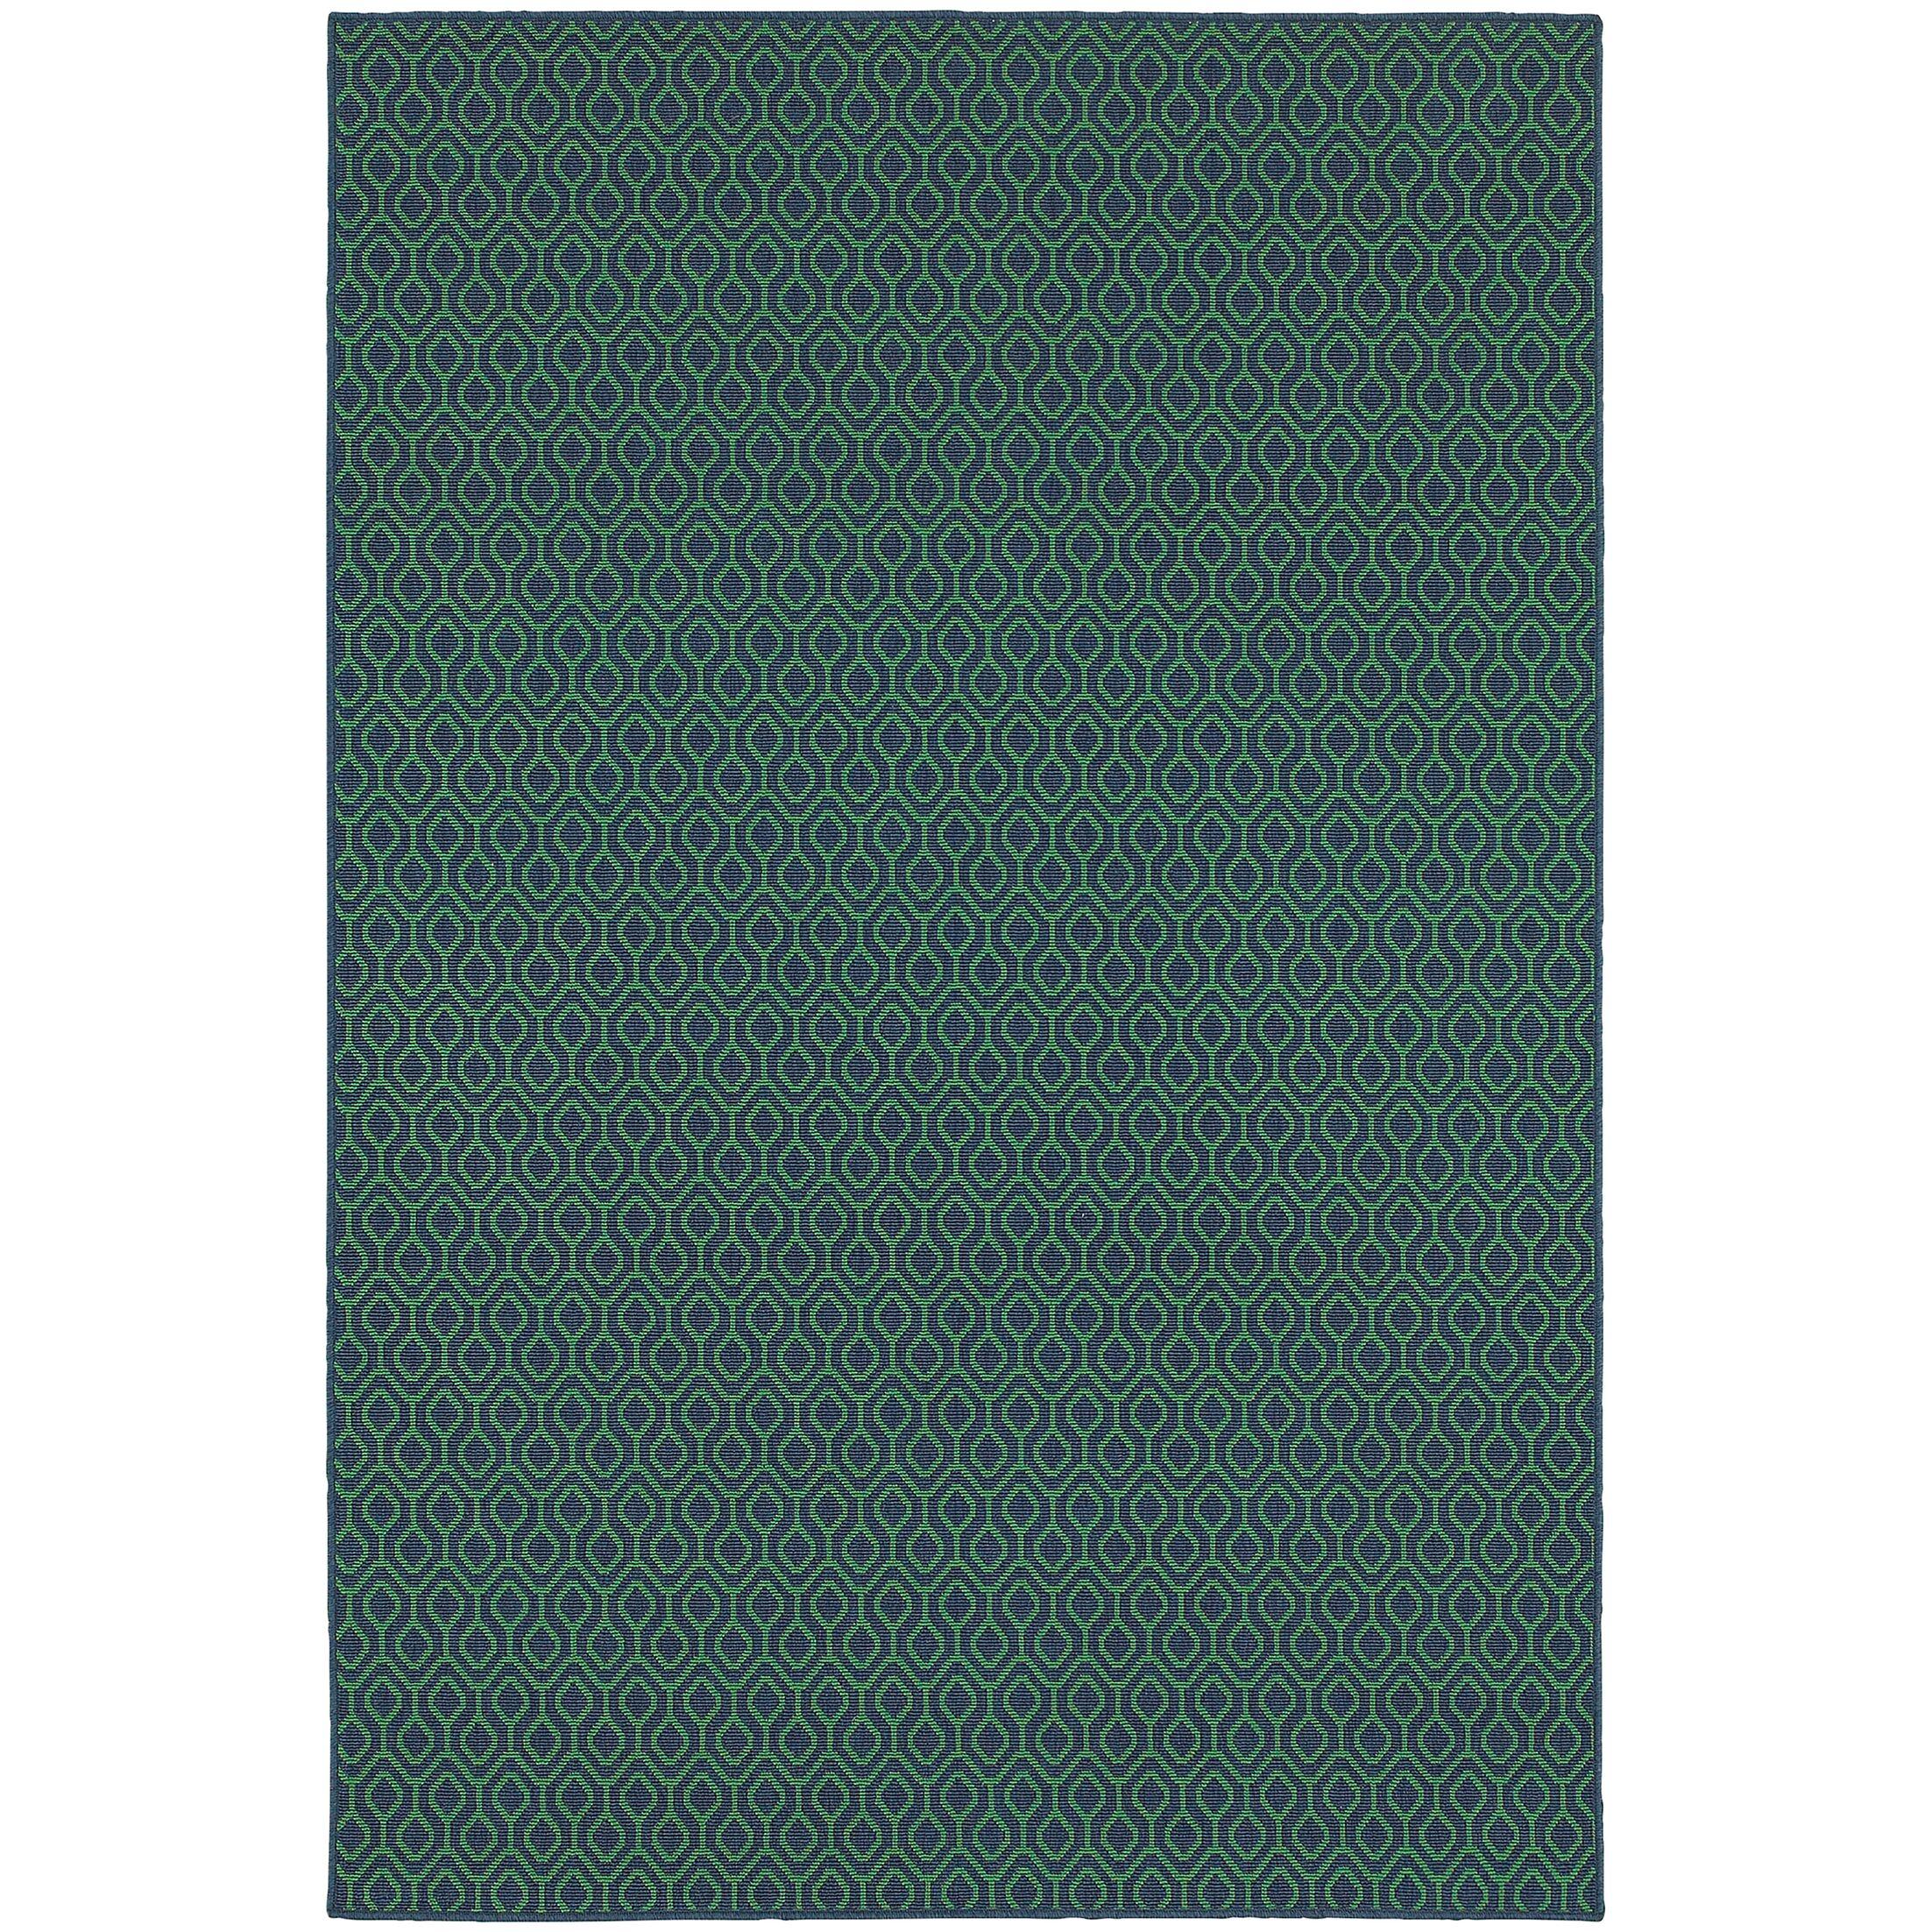 Kailani Trellis Navy/Green Indoor/Outdoor Area Rug Rug Size: Rectangle 5'3